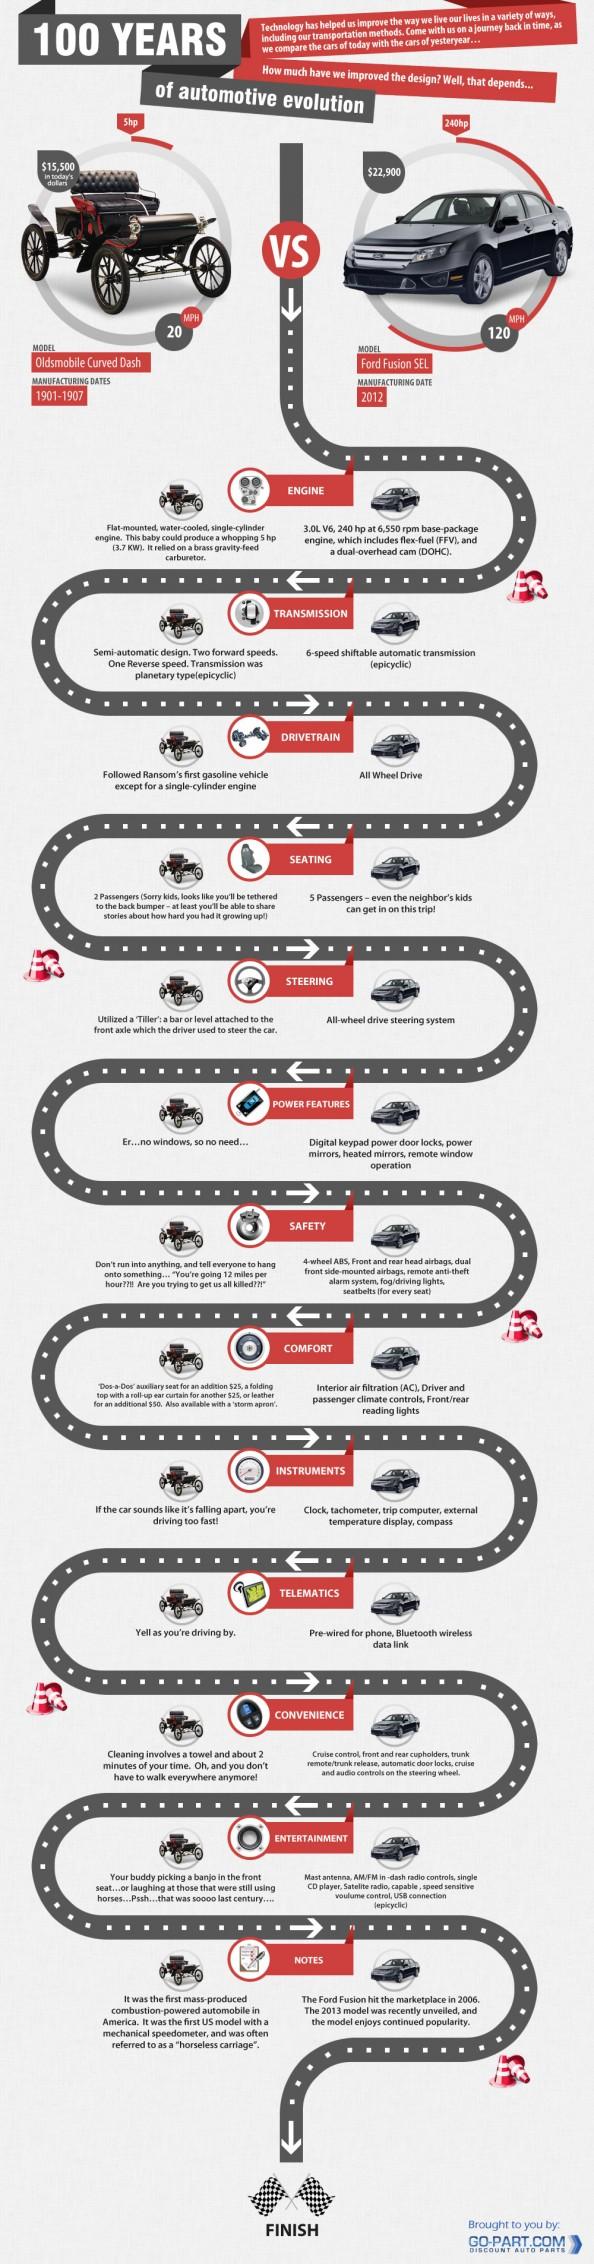 100 Years of Automotive Evolution